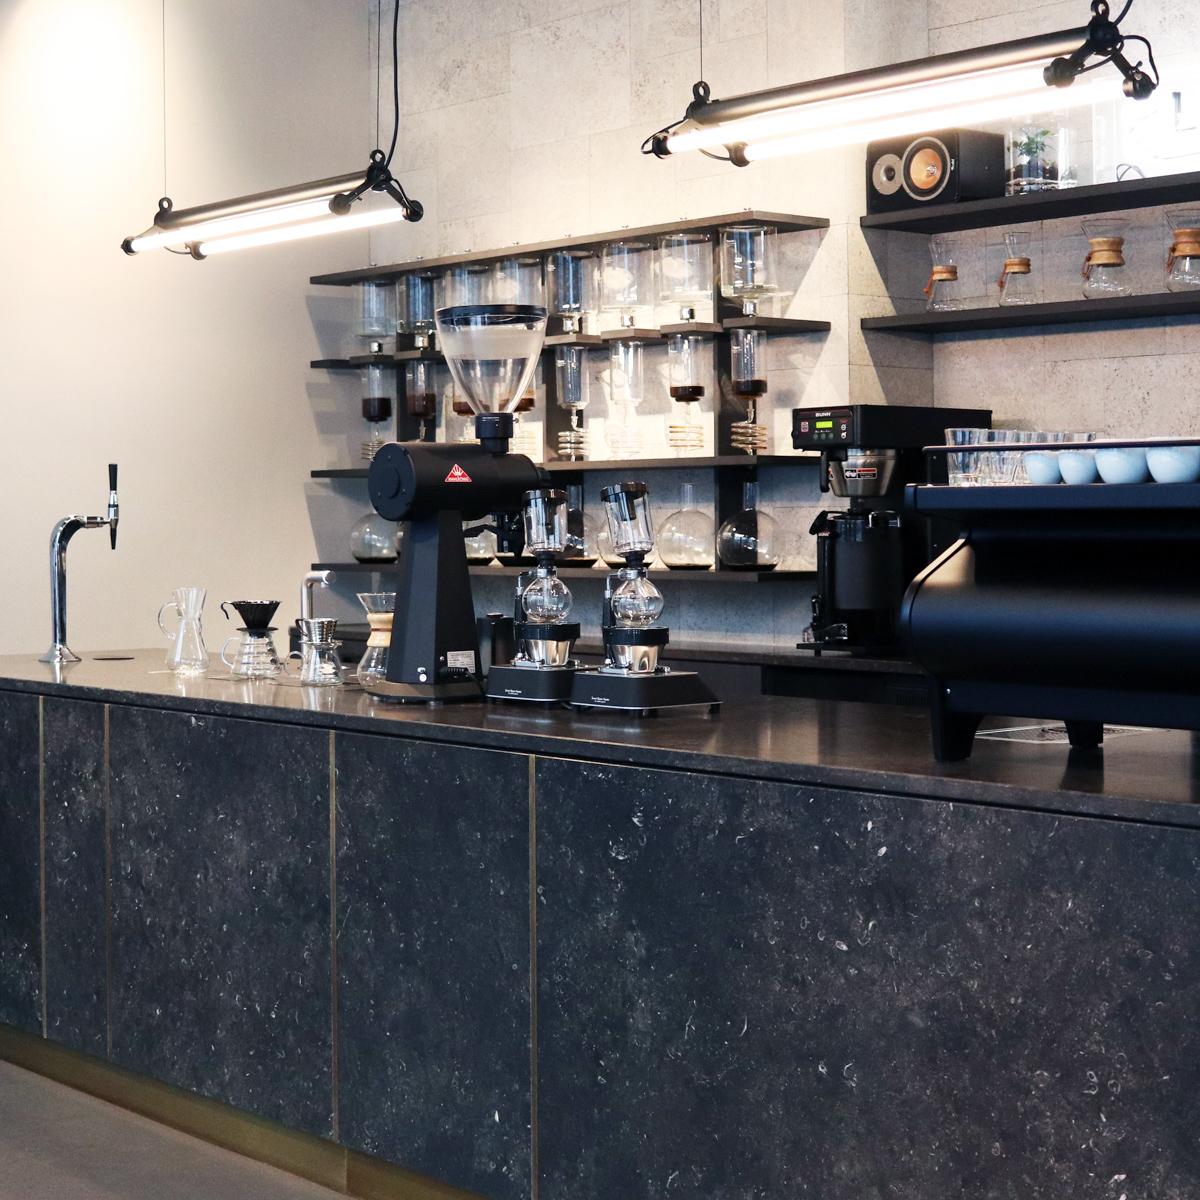 Elbgold Coffee Bar Hamburg Innenstadt-2